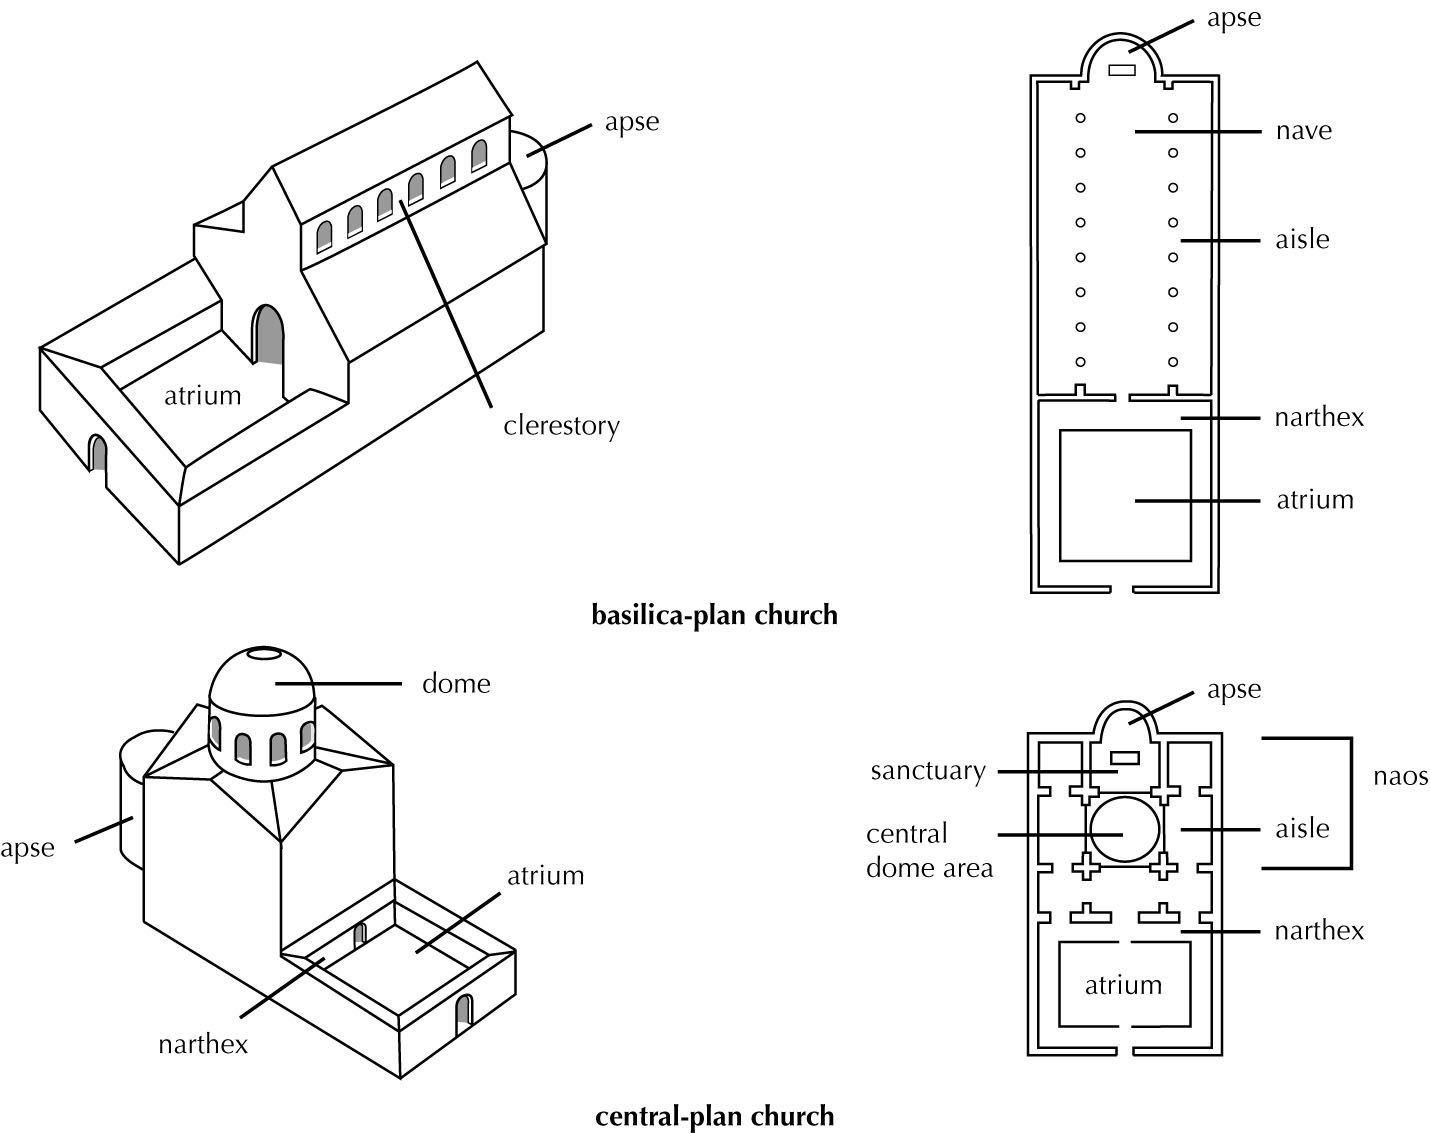 basilica church plan [ 1430 x 1133 Pixel ]